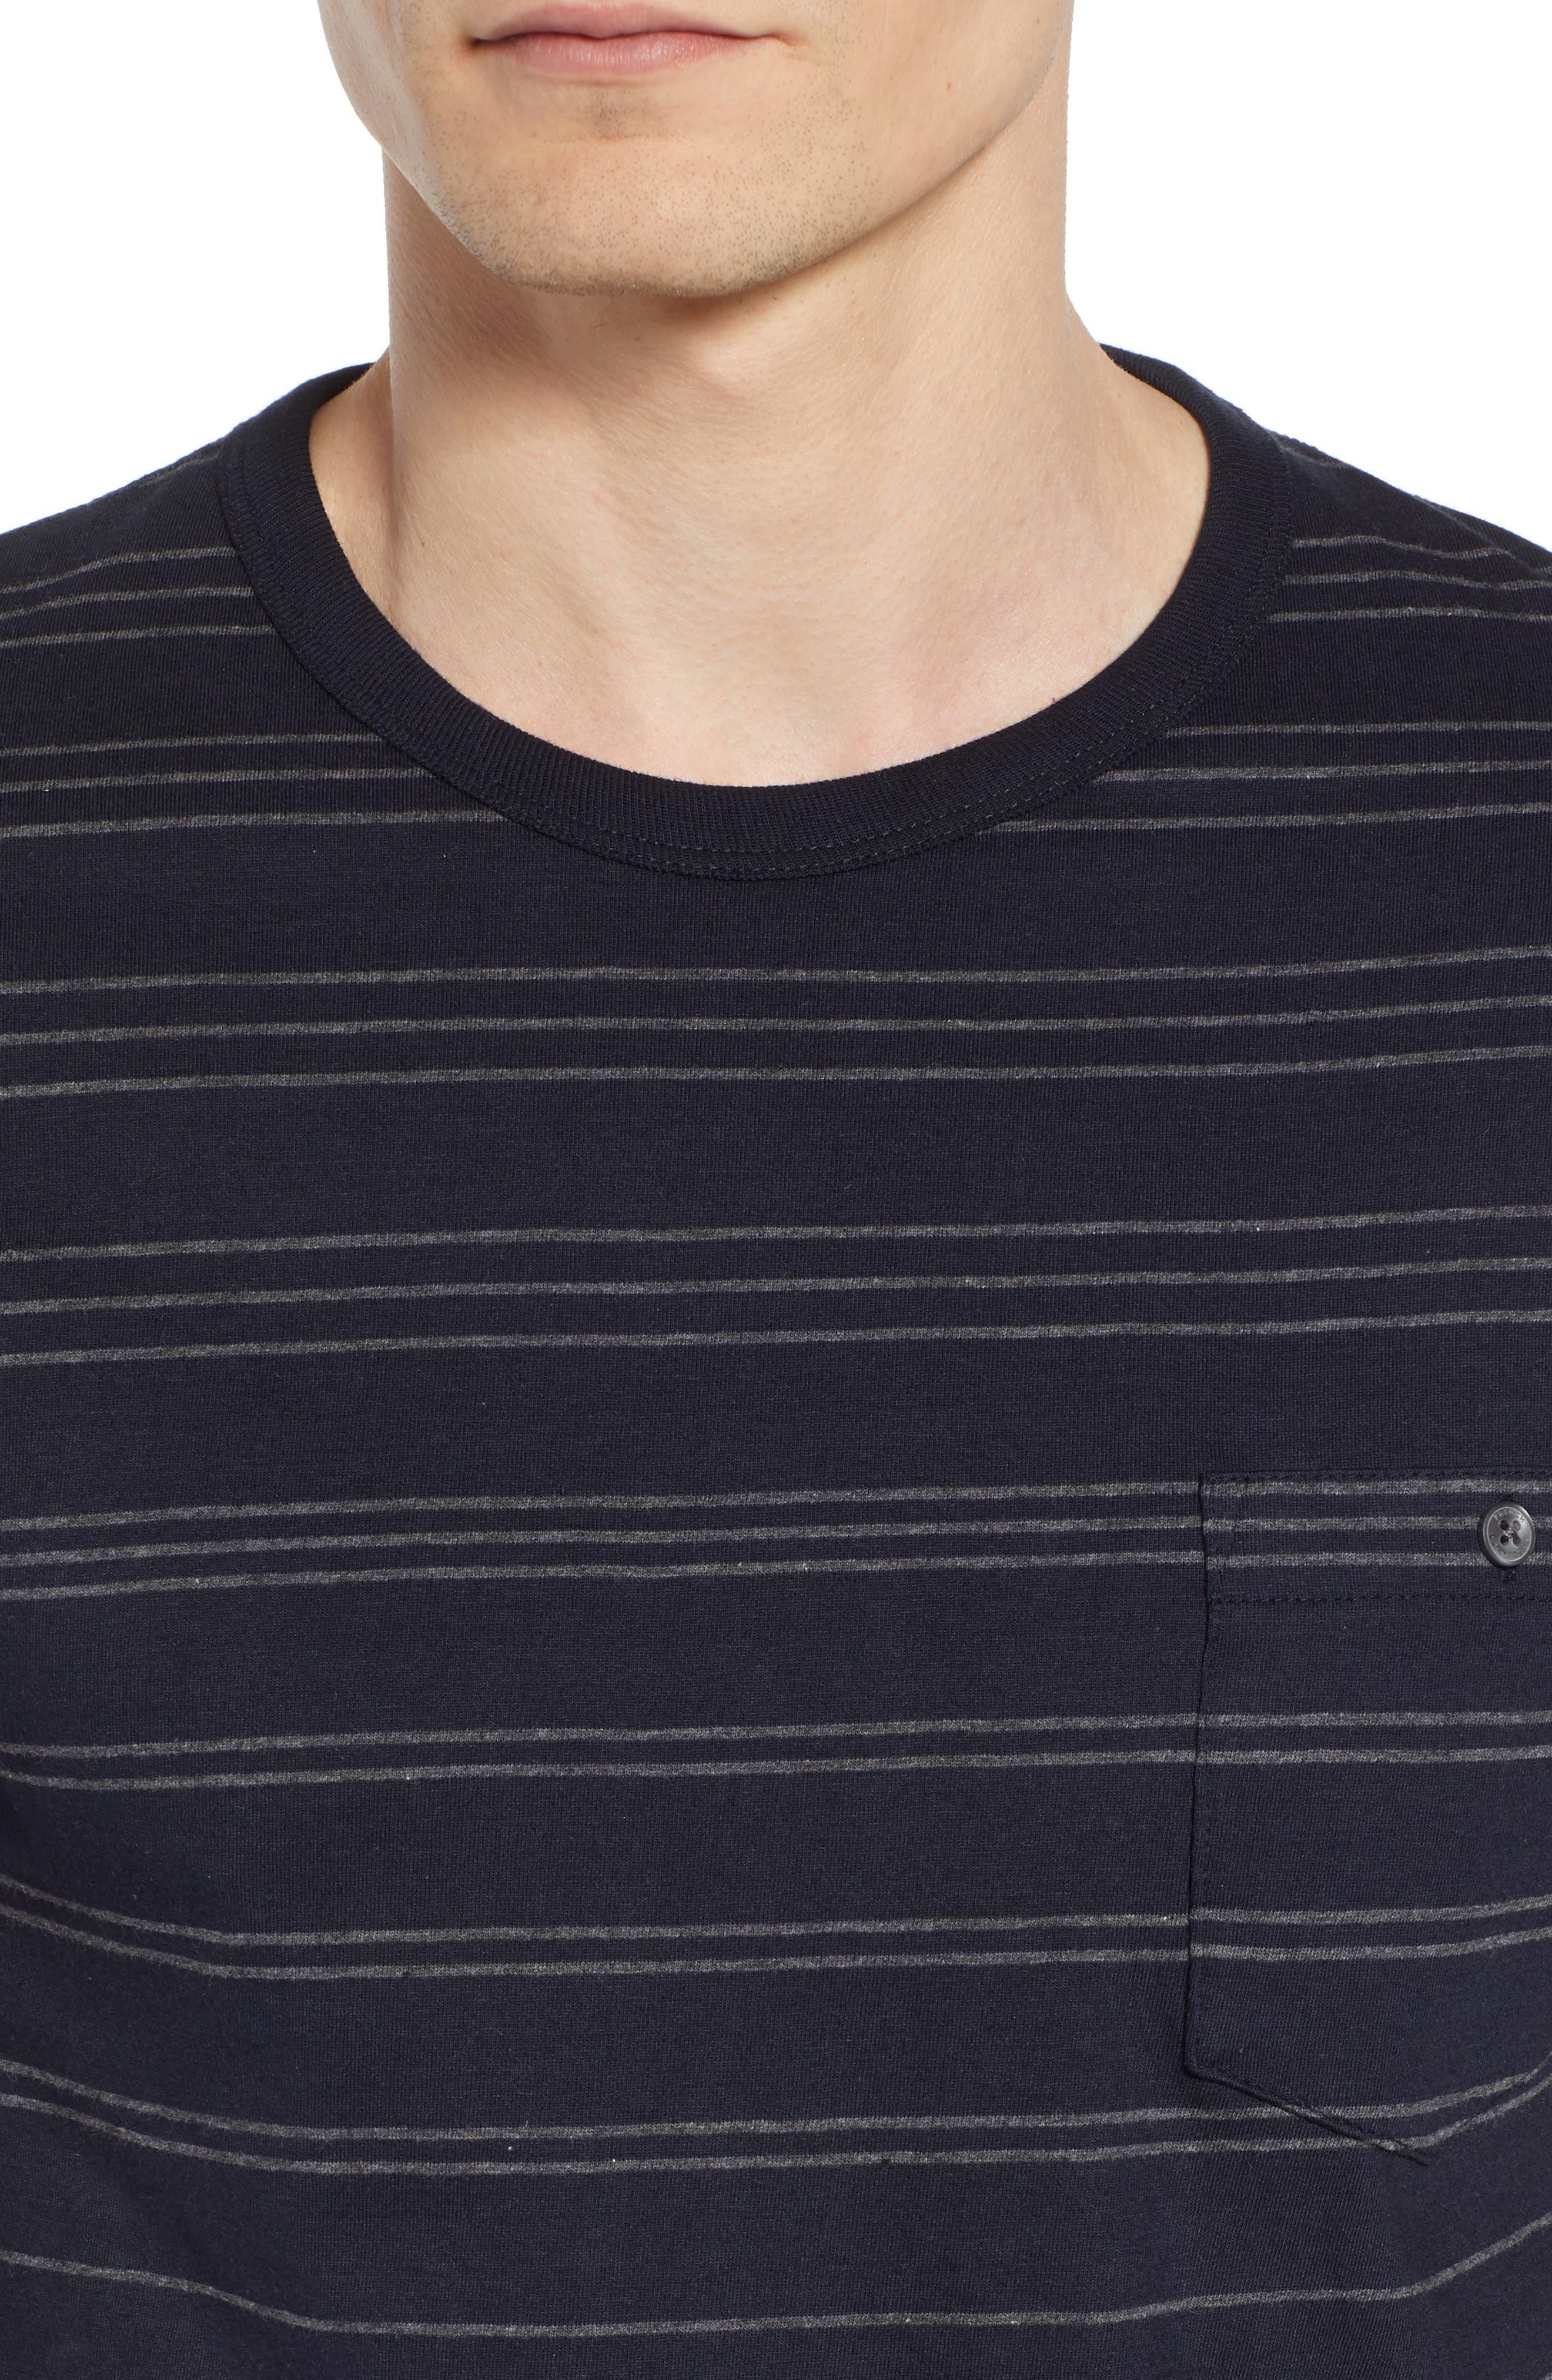 Summer Graded Stripe Pocket T-Shirt,                             Alternate thumbnail 4, color,                             Marine Blue Charcoal Melange